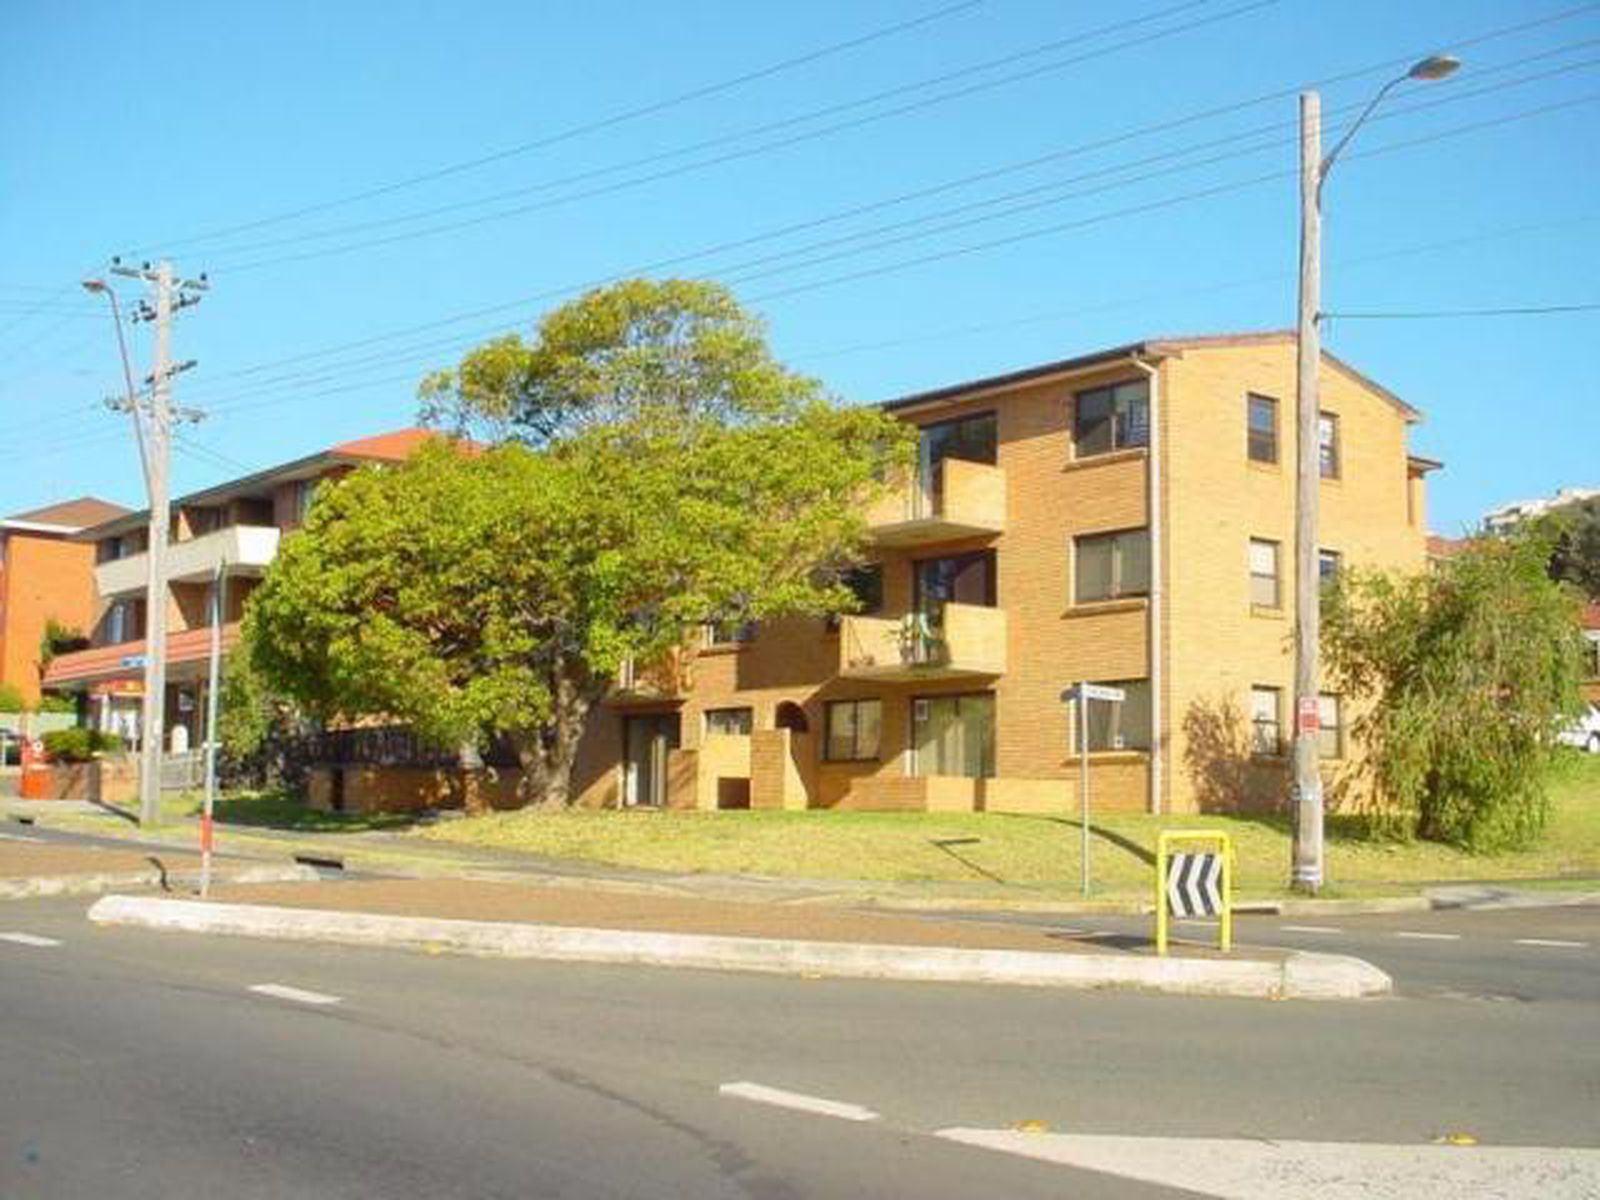 7 / 45 Bourke Street, North Wollongong